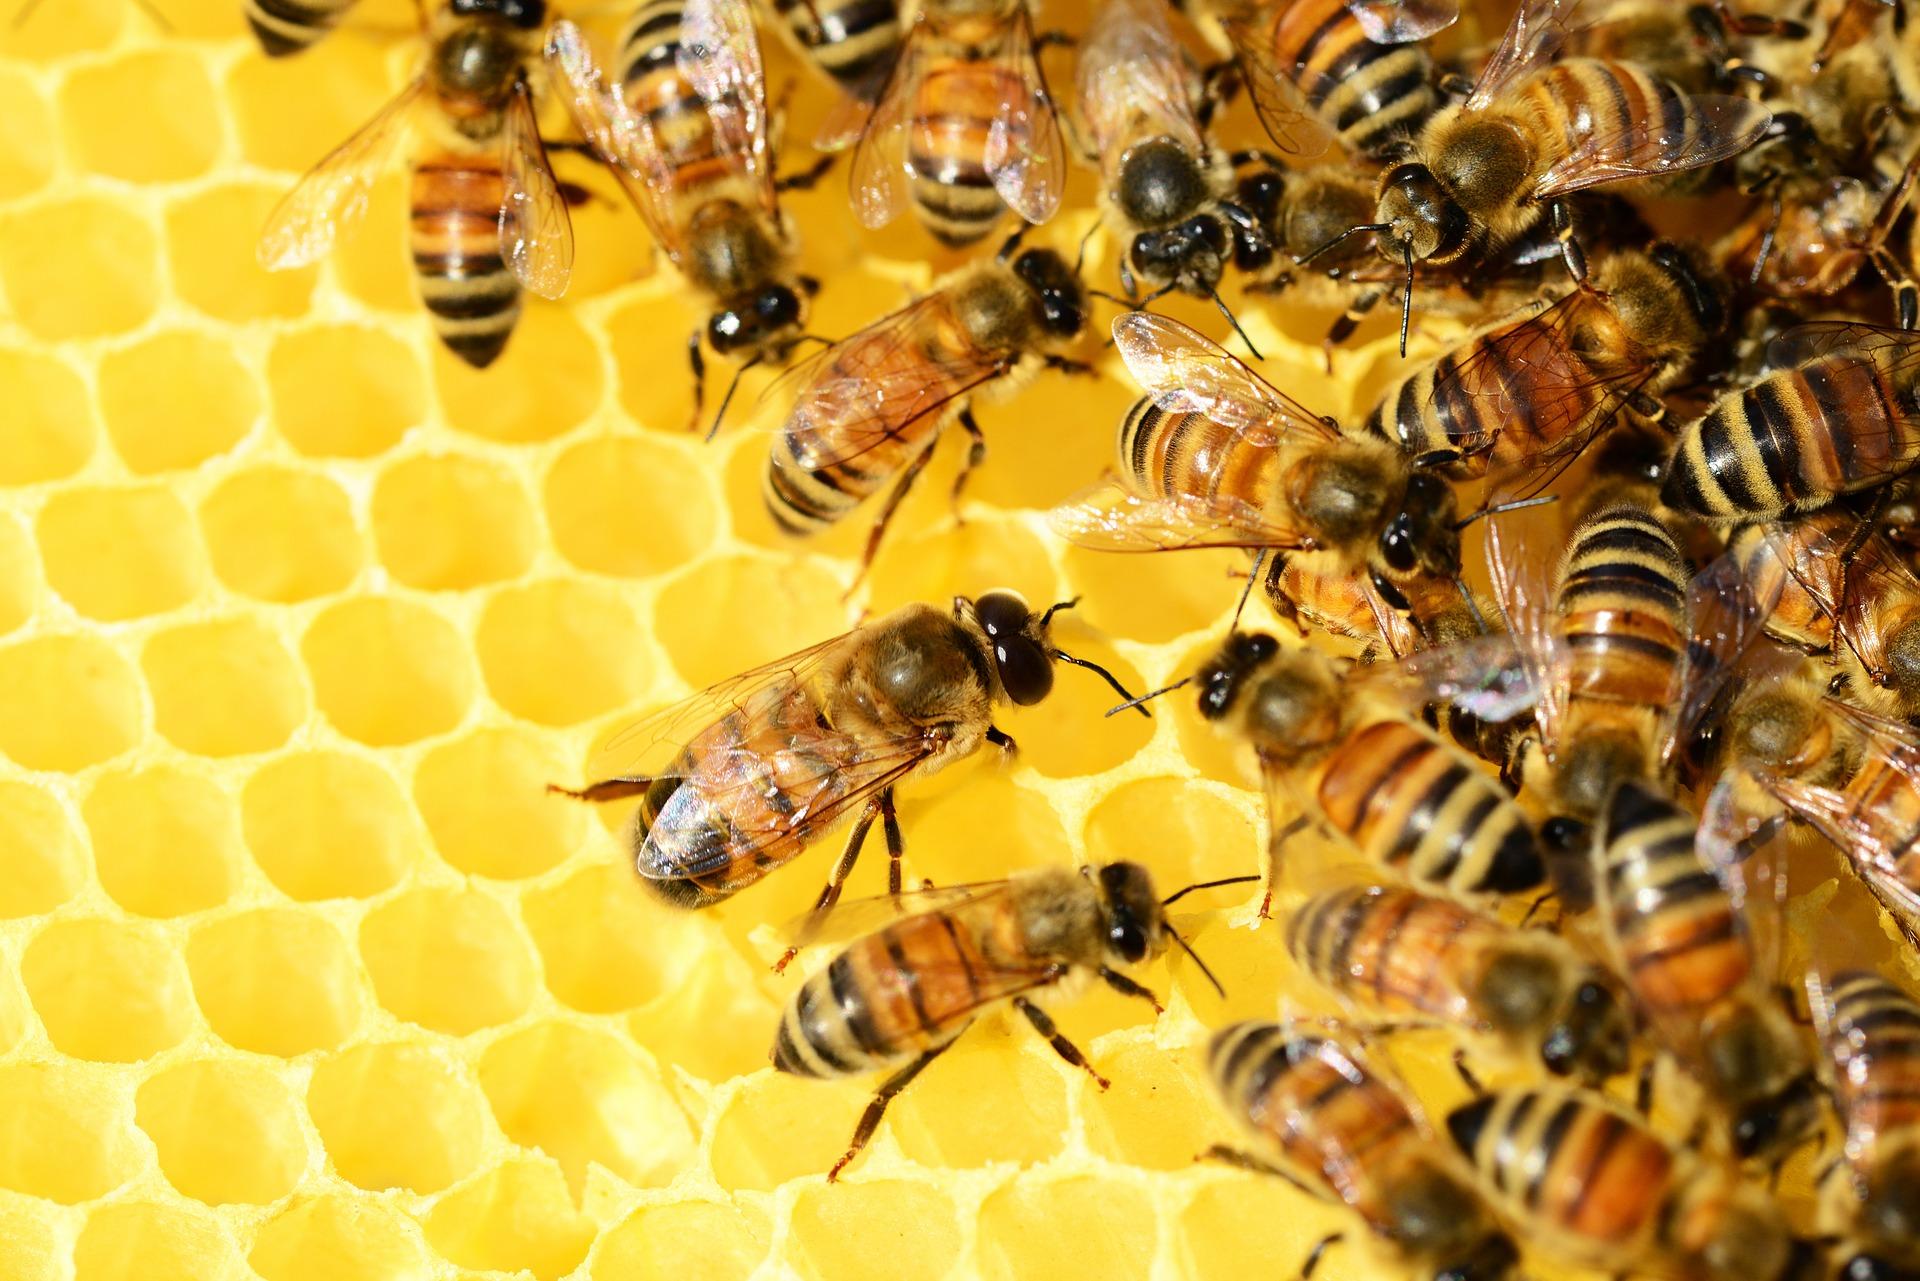 honey-bees-326337_1920 (1)